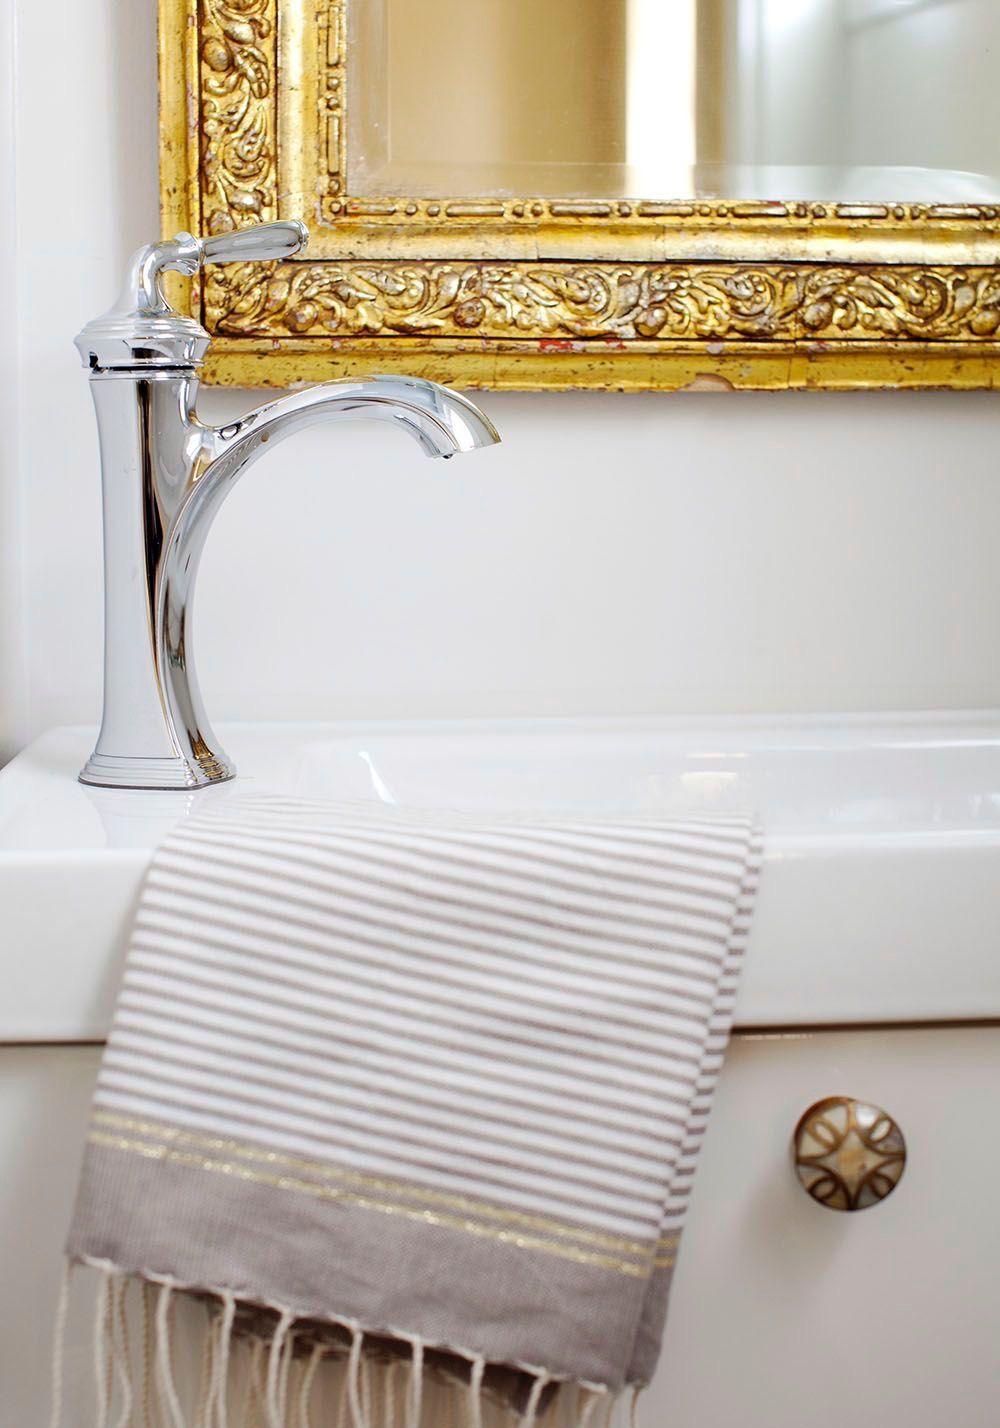 Pin By Jodi On Glamorous Hardware Cottage Bathroom Bathroom Inspiration Guest Bathroom